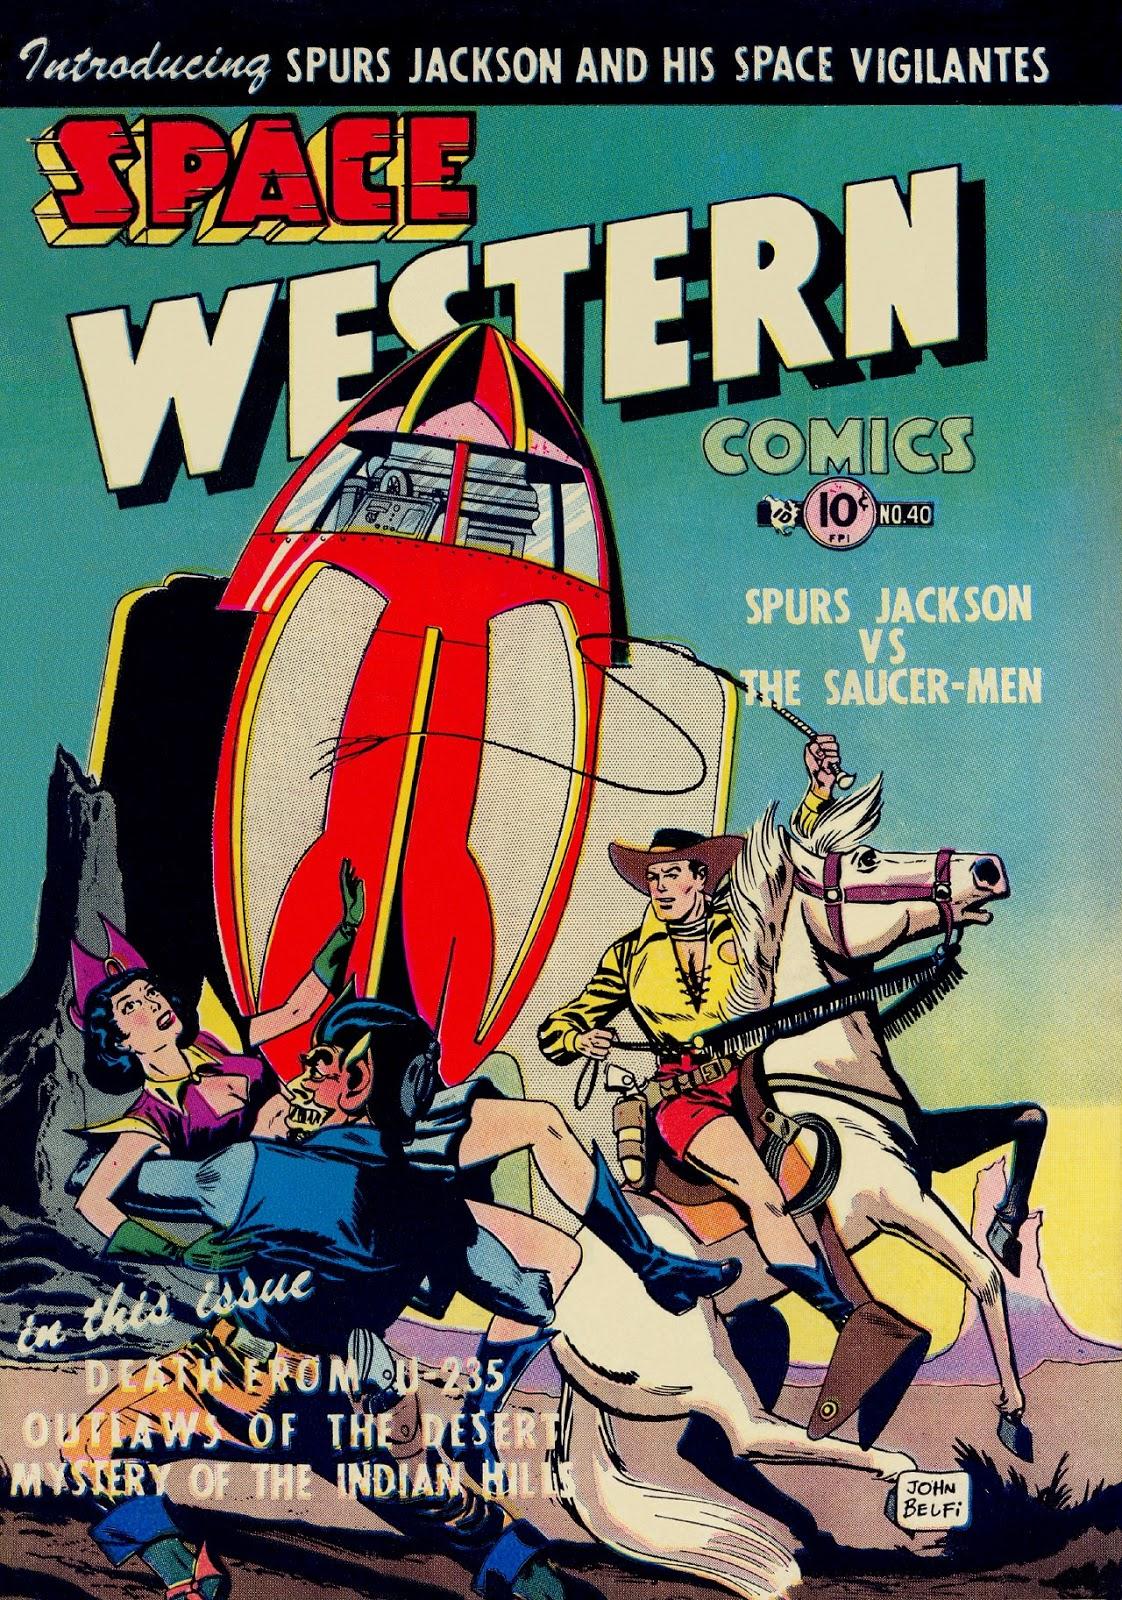 Space Western Wikipedia